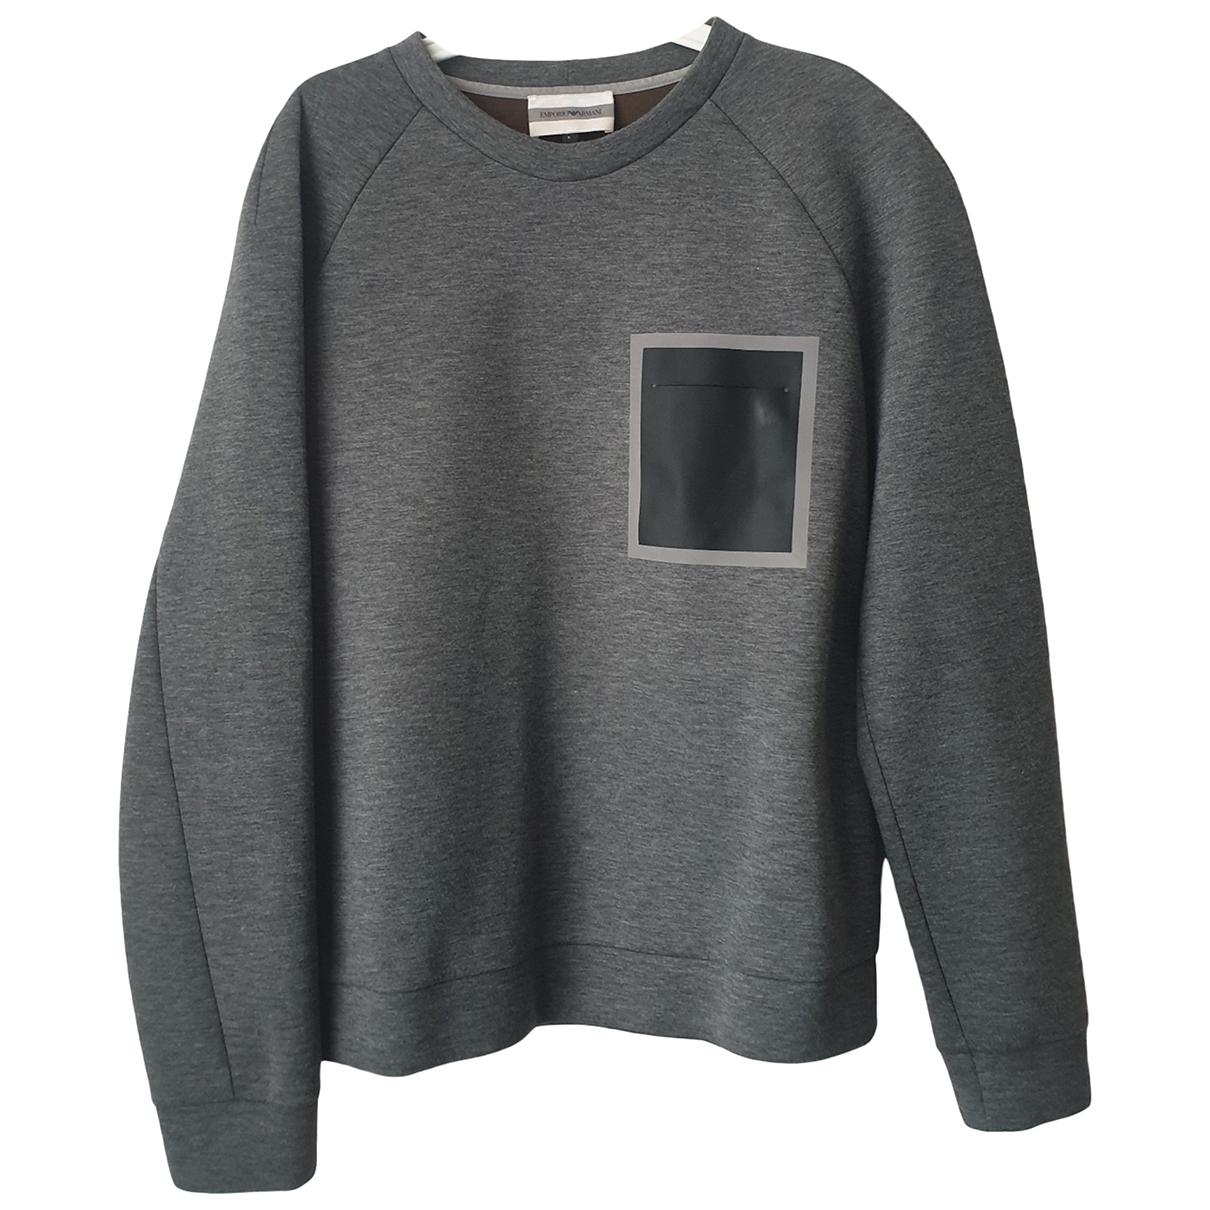 Emporio Armani N Grey Cotton Knitwear & Sweatshirts for Men L International